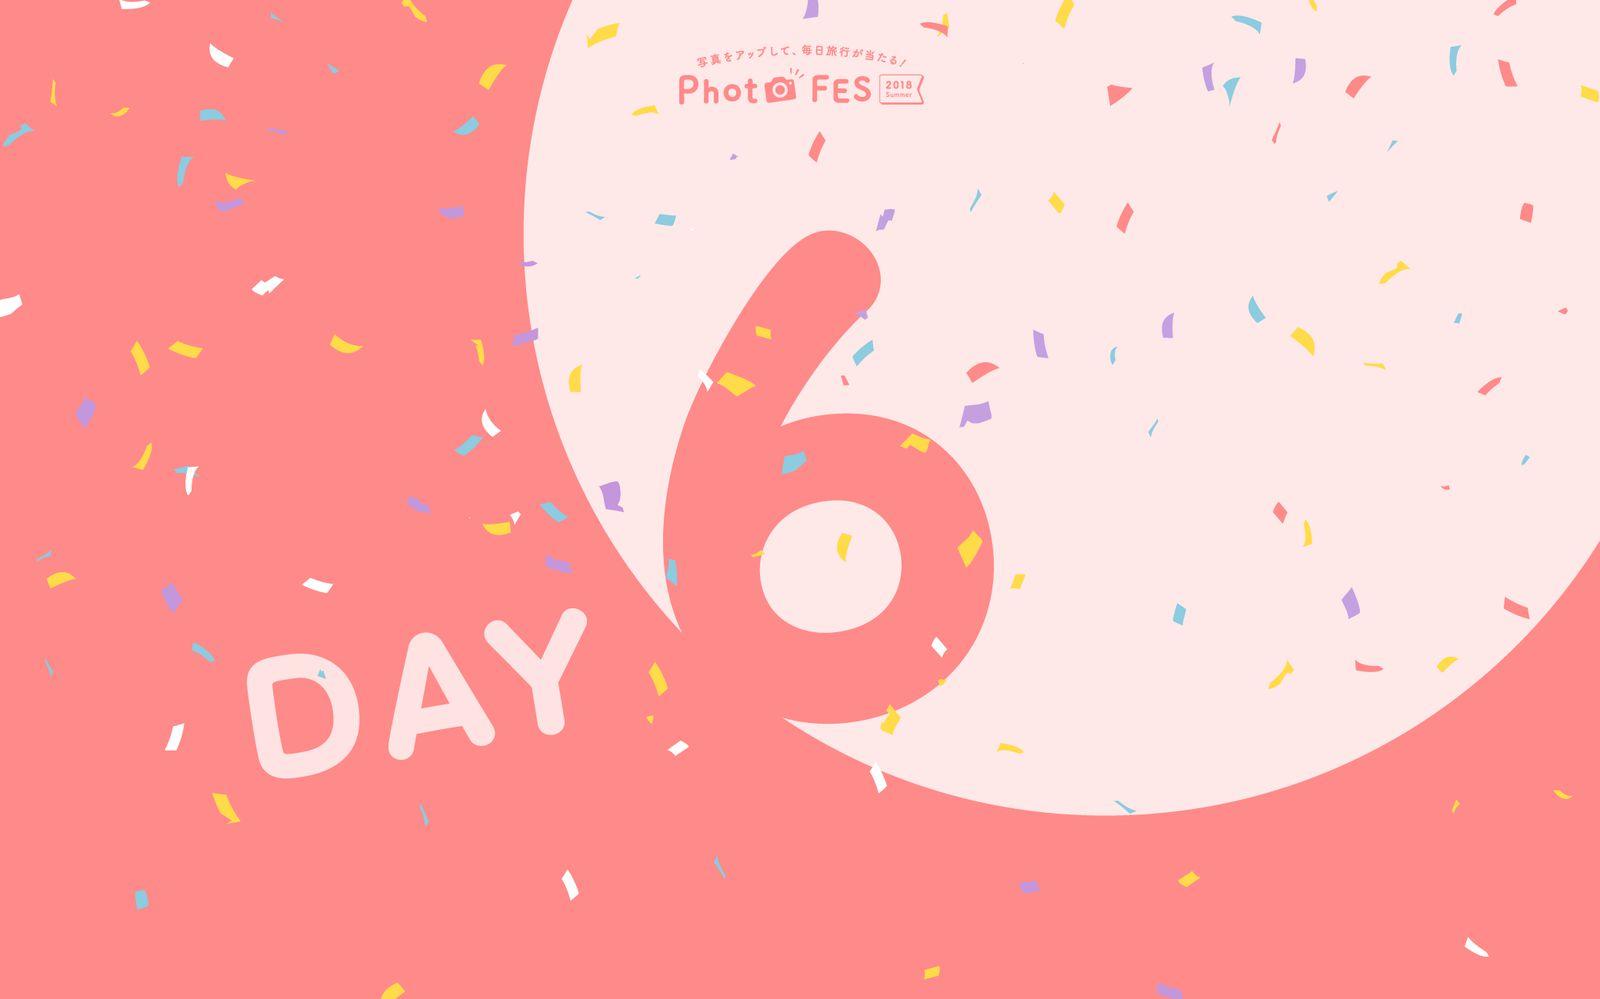 【DAY6】「Photo FES 2018」7月1日投稿分であたる賞品&受賞者発表